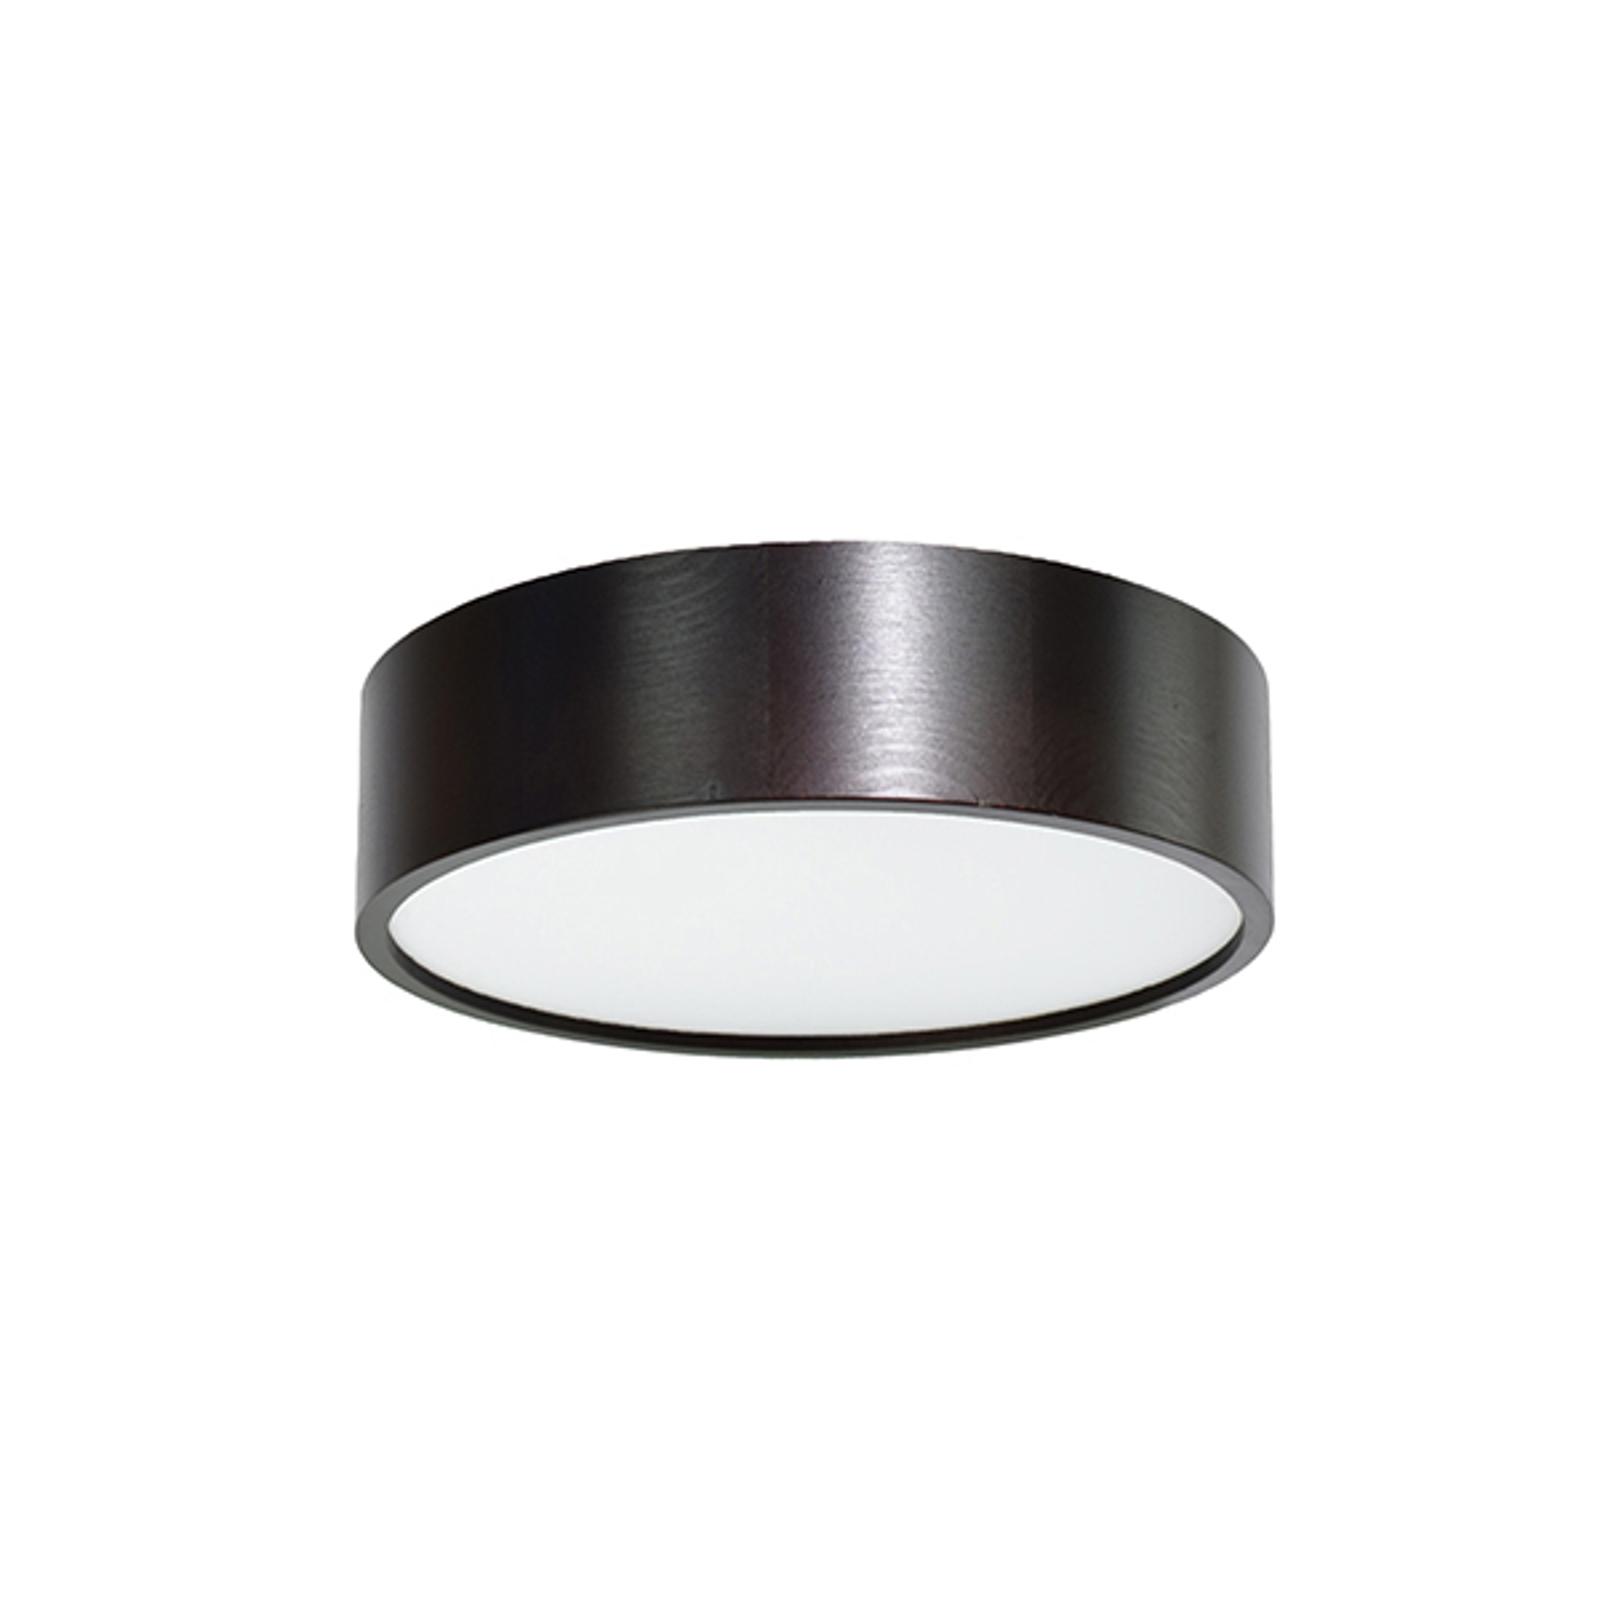 LED-taklampe Cleo, Ø28cm svart